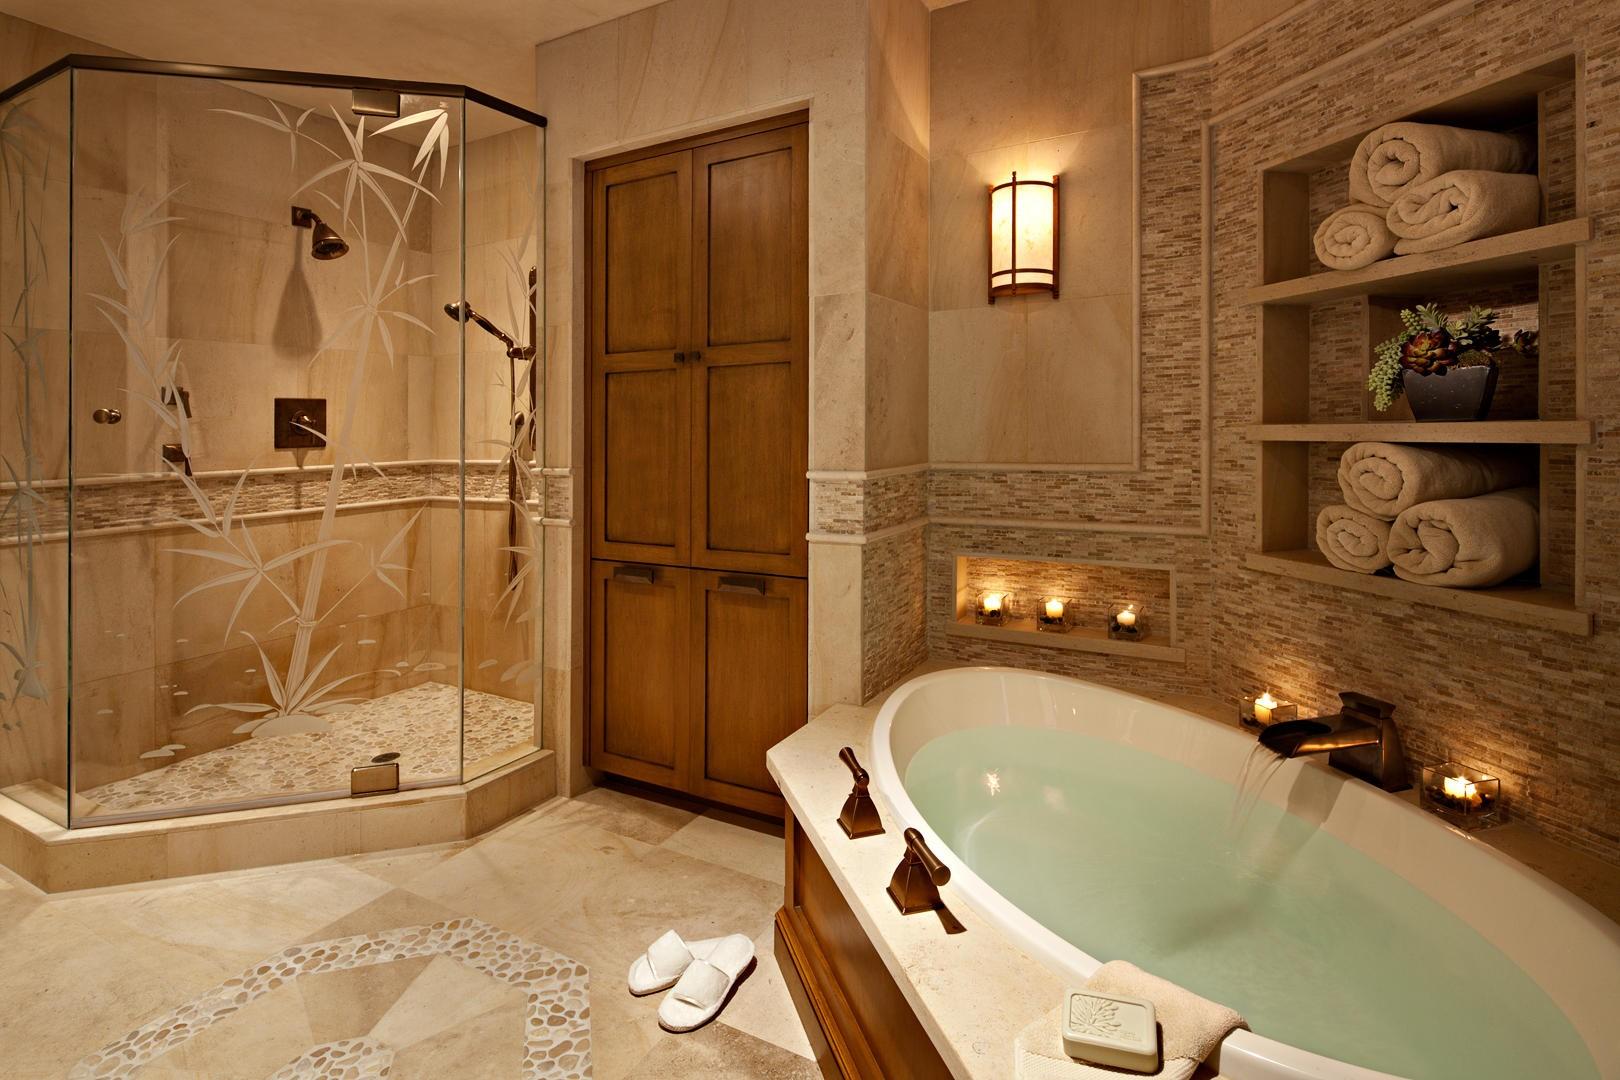 spa bathroom design ideas pictures photo - 3